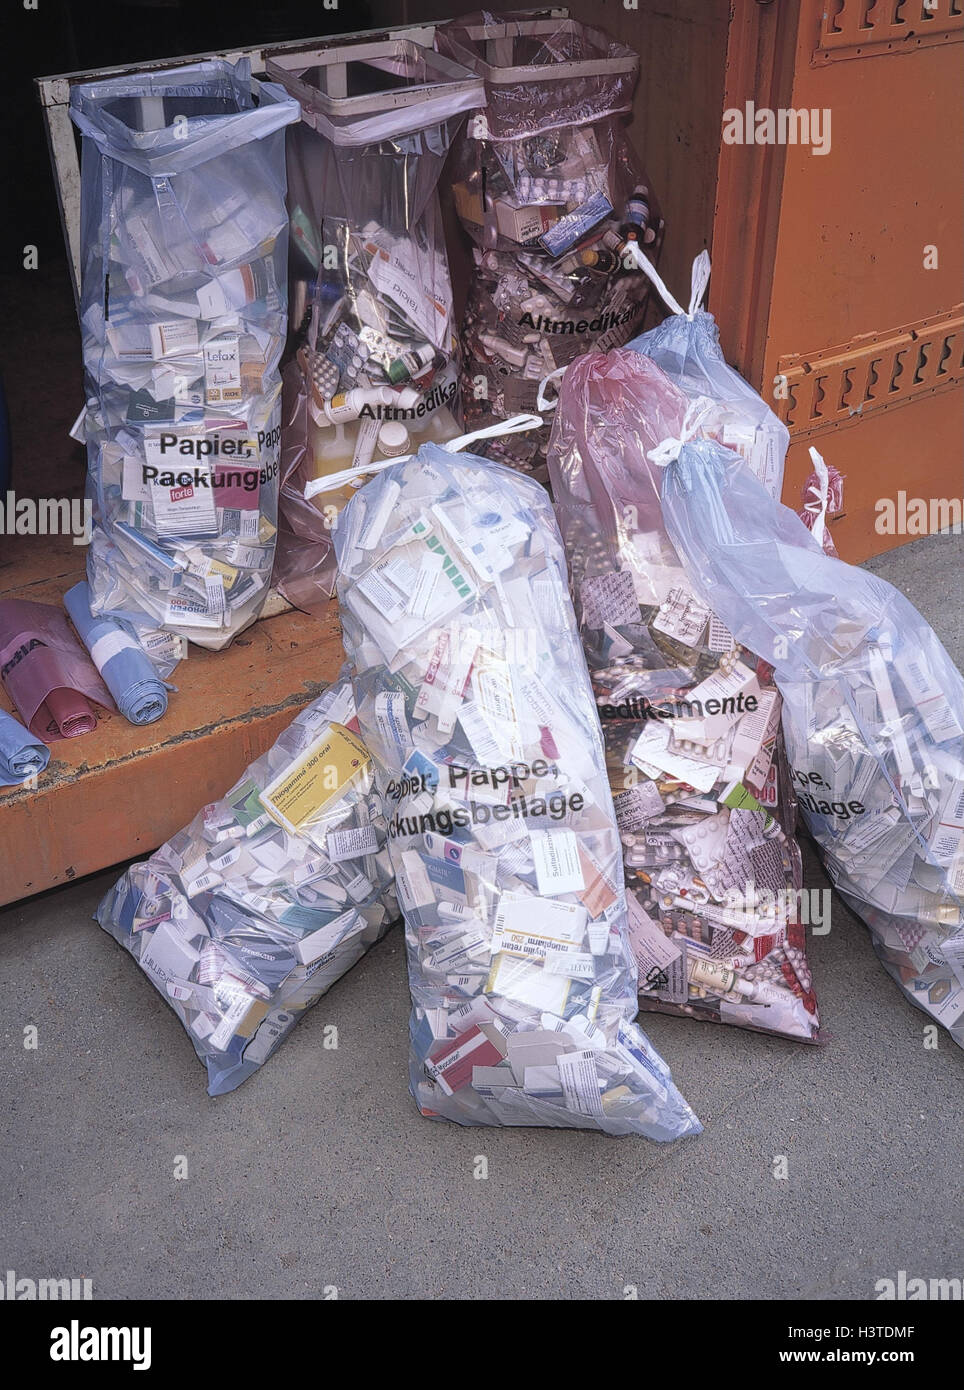 Hazardous wastes, bags, Old drugs, problem garbage, envelopes, instructions, garbage separation, environmental discharge, - Stock Image